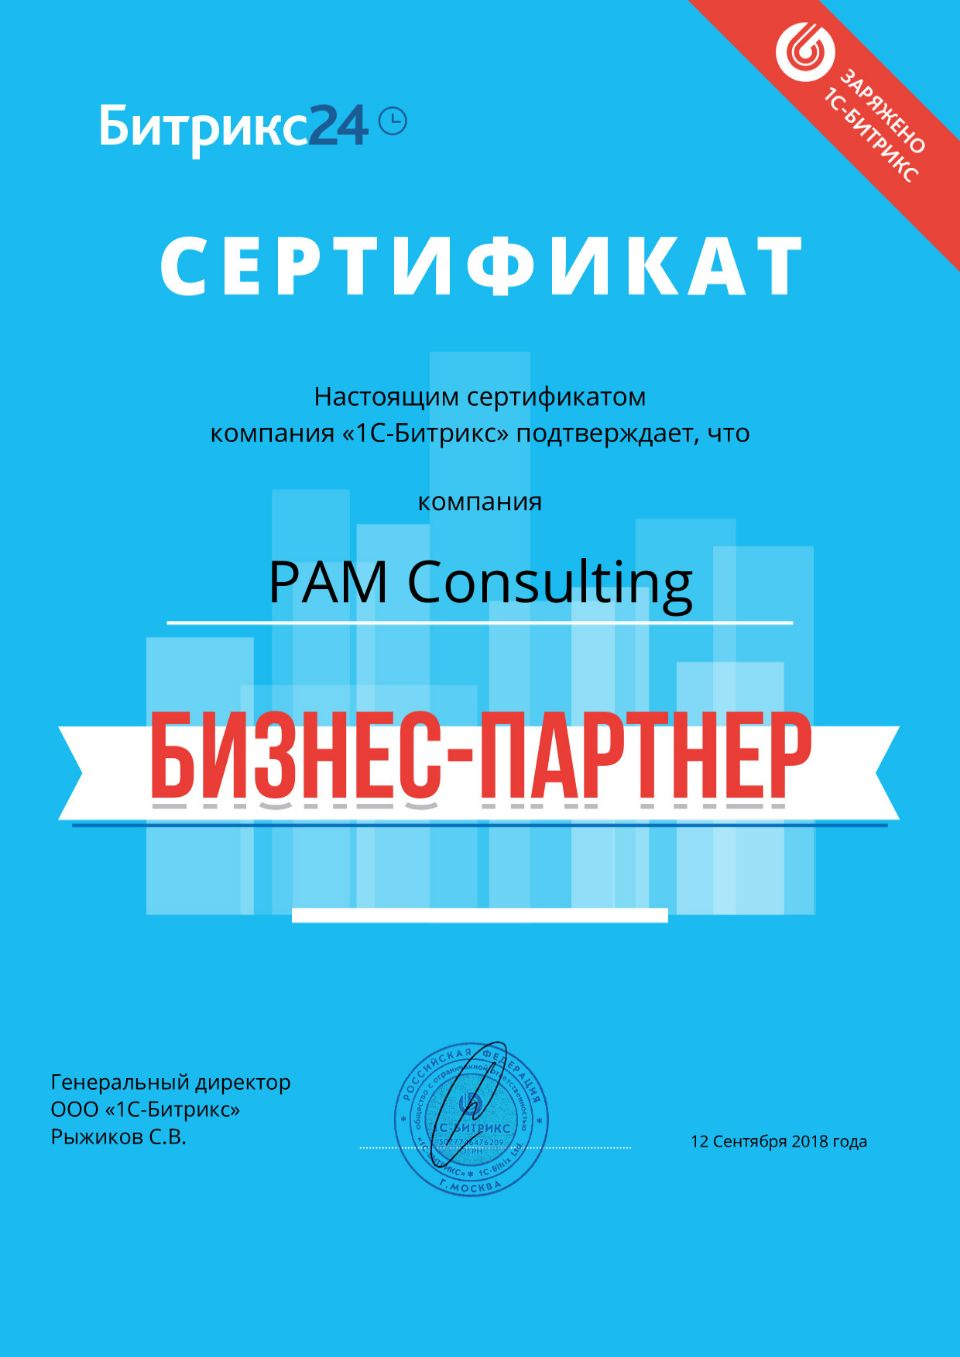 Сертификат Бизнес-партнер Битрикс24 PAM Consulting